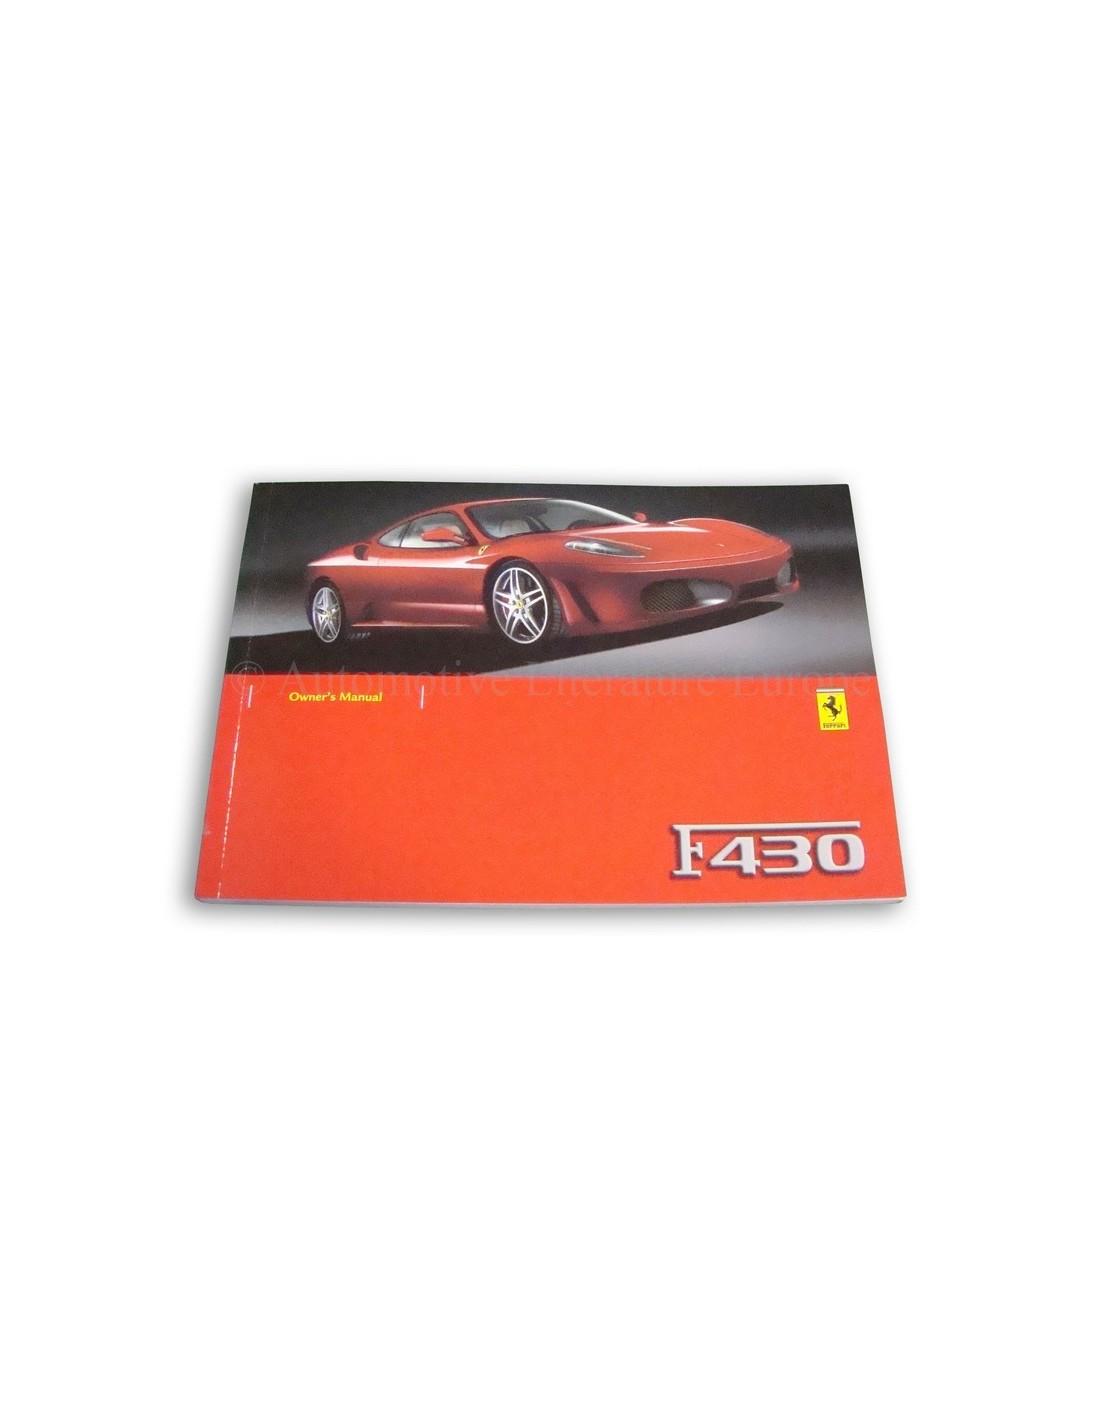 Service Manual 2006 Ferrari F430 Radio Replacement 2006 Ferrari F430 Body Repair Procedures